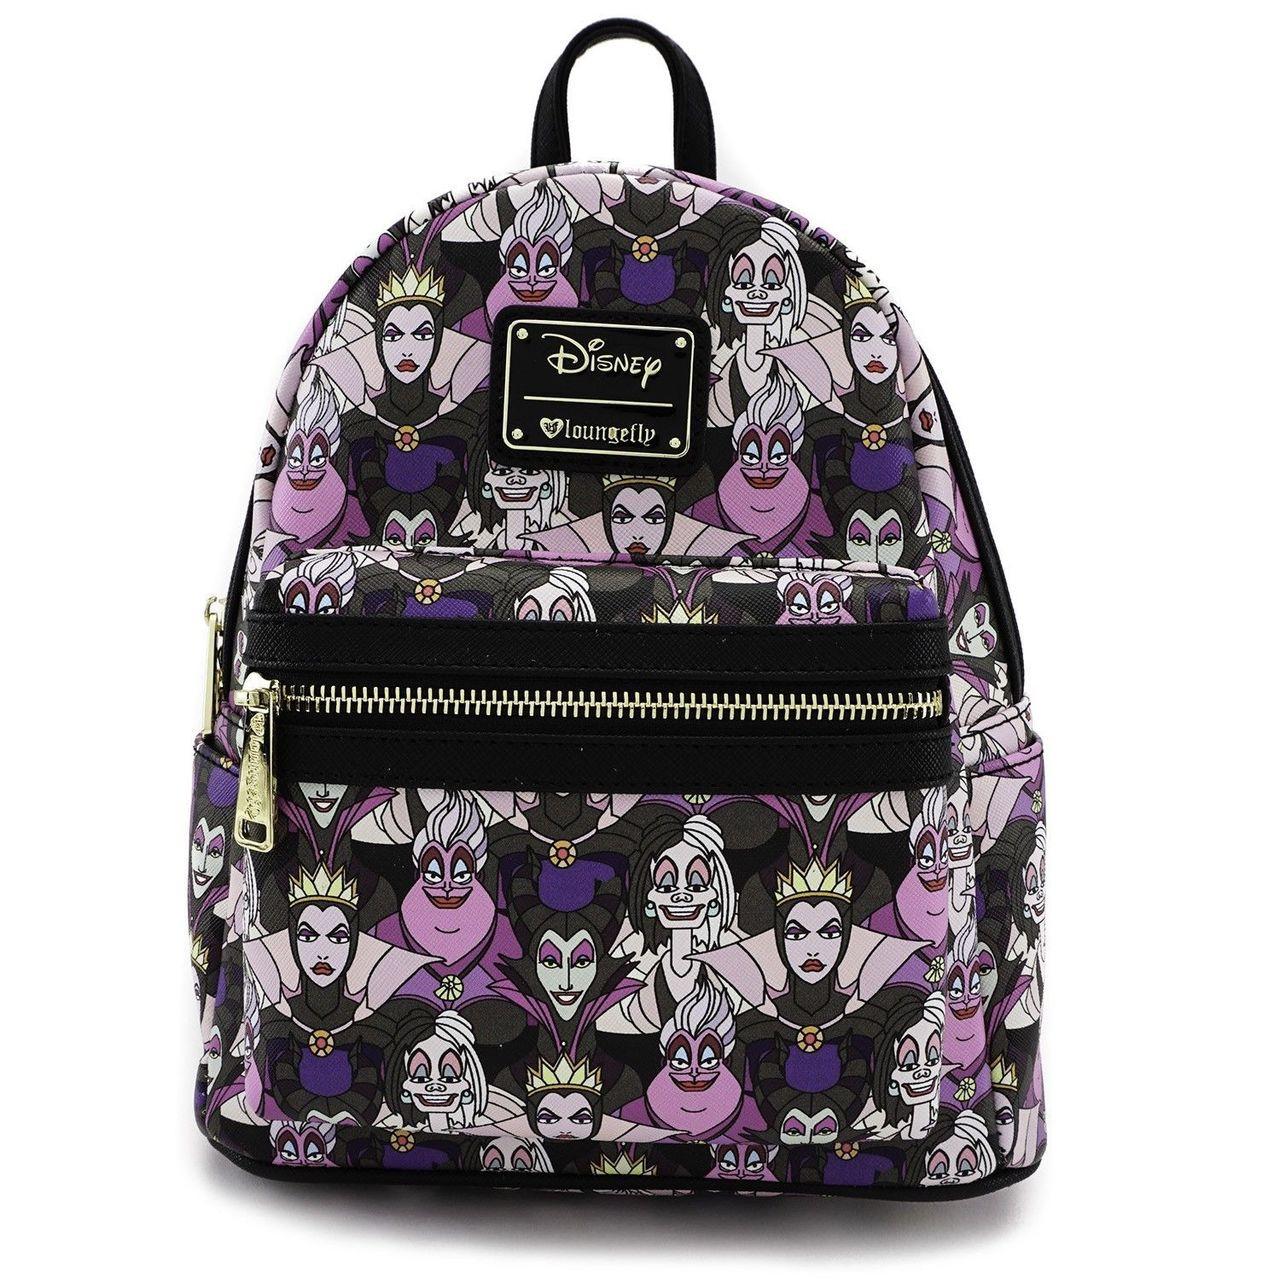 Loungefly Disney Villains Ursula Cruella Maleficent Mini Backpack Wdbk0385